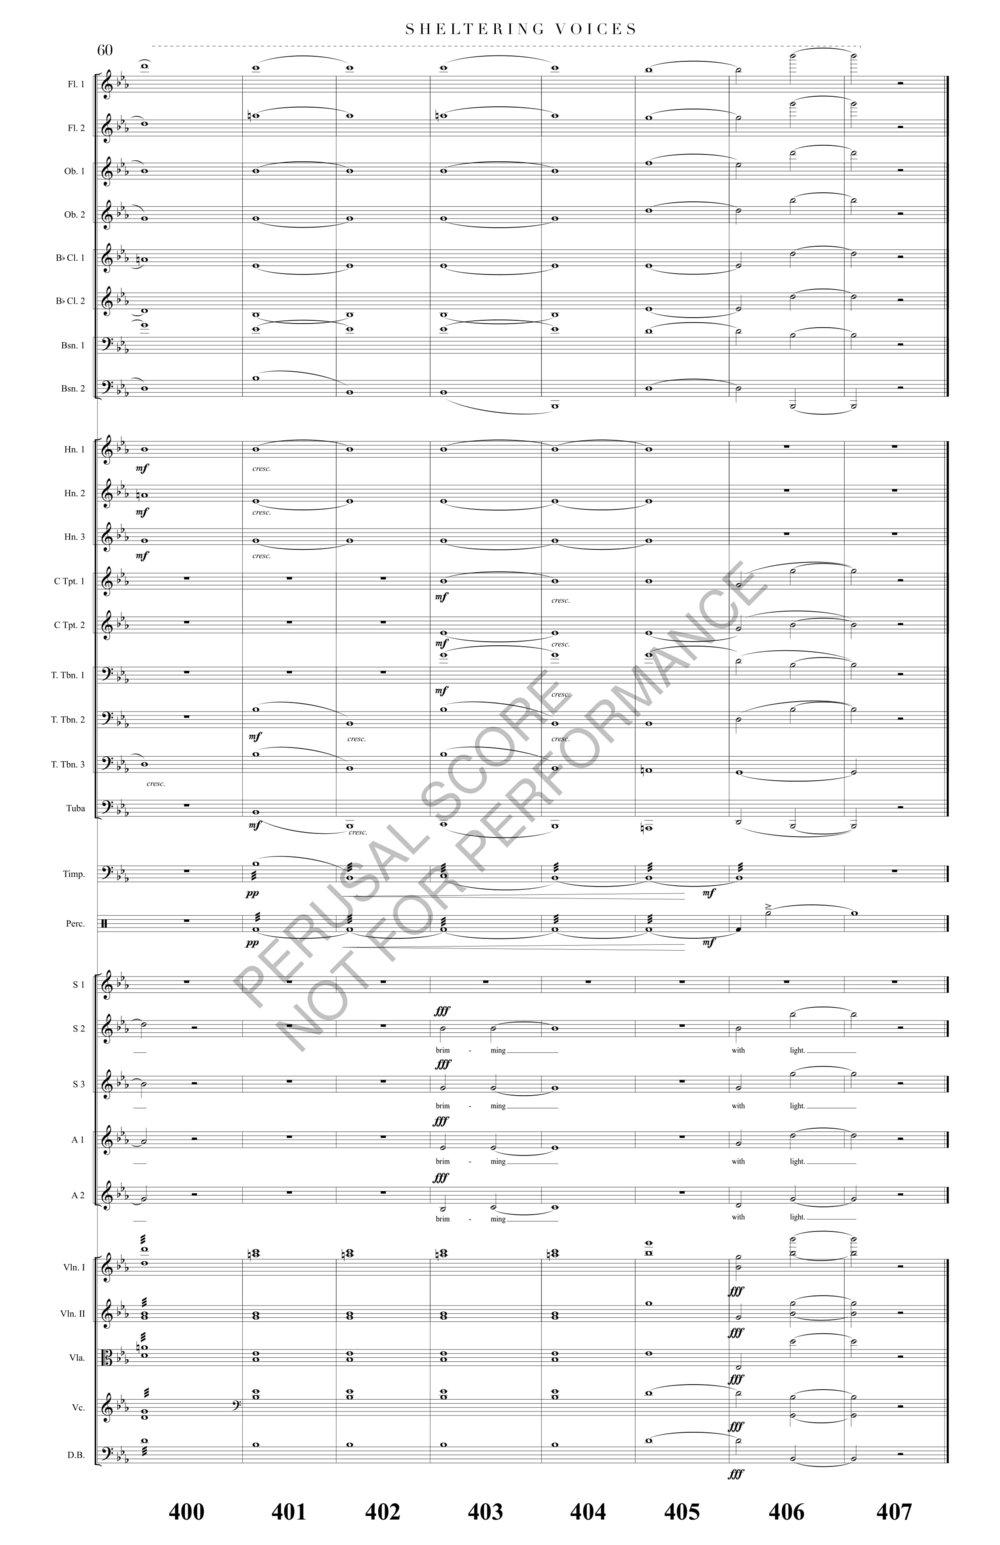 Boyd Sheltering Voices Score-watermark-68.jpg